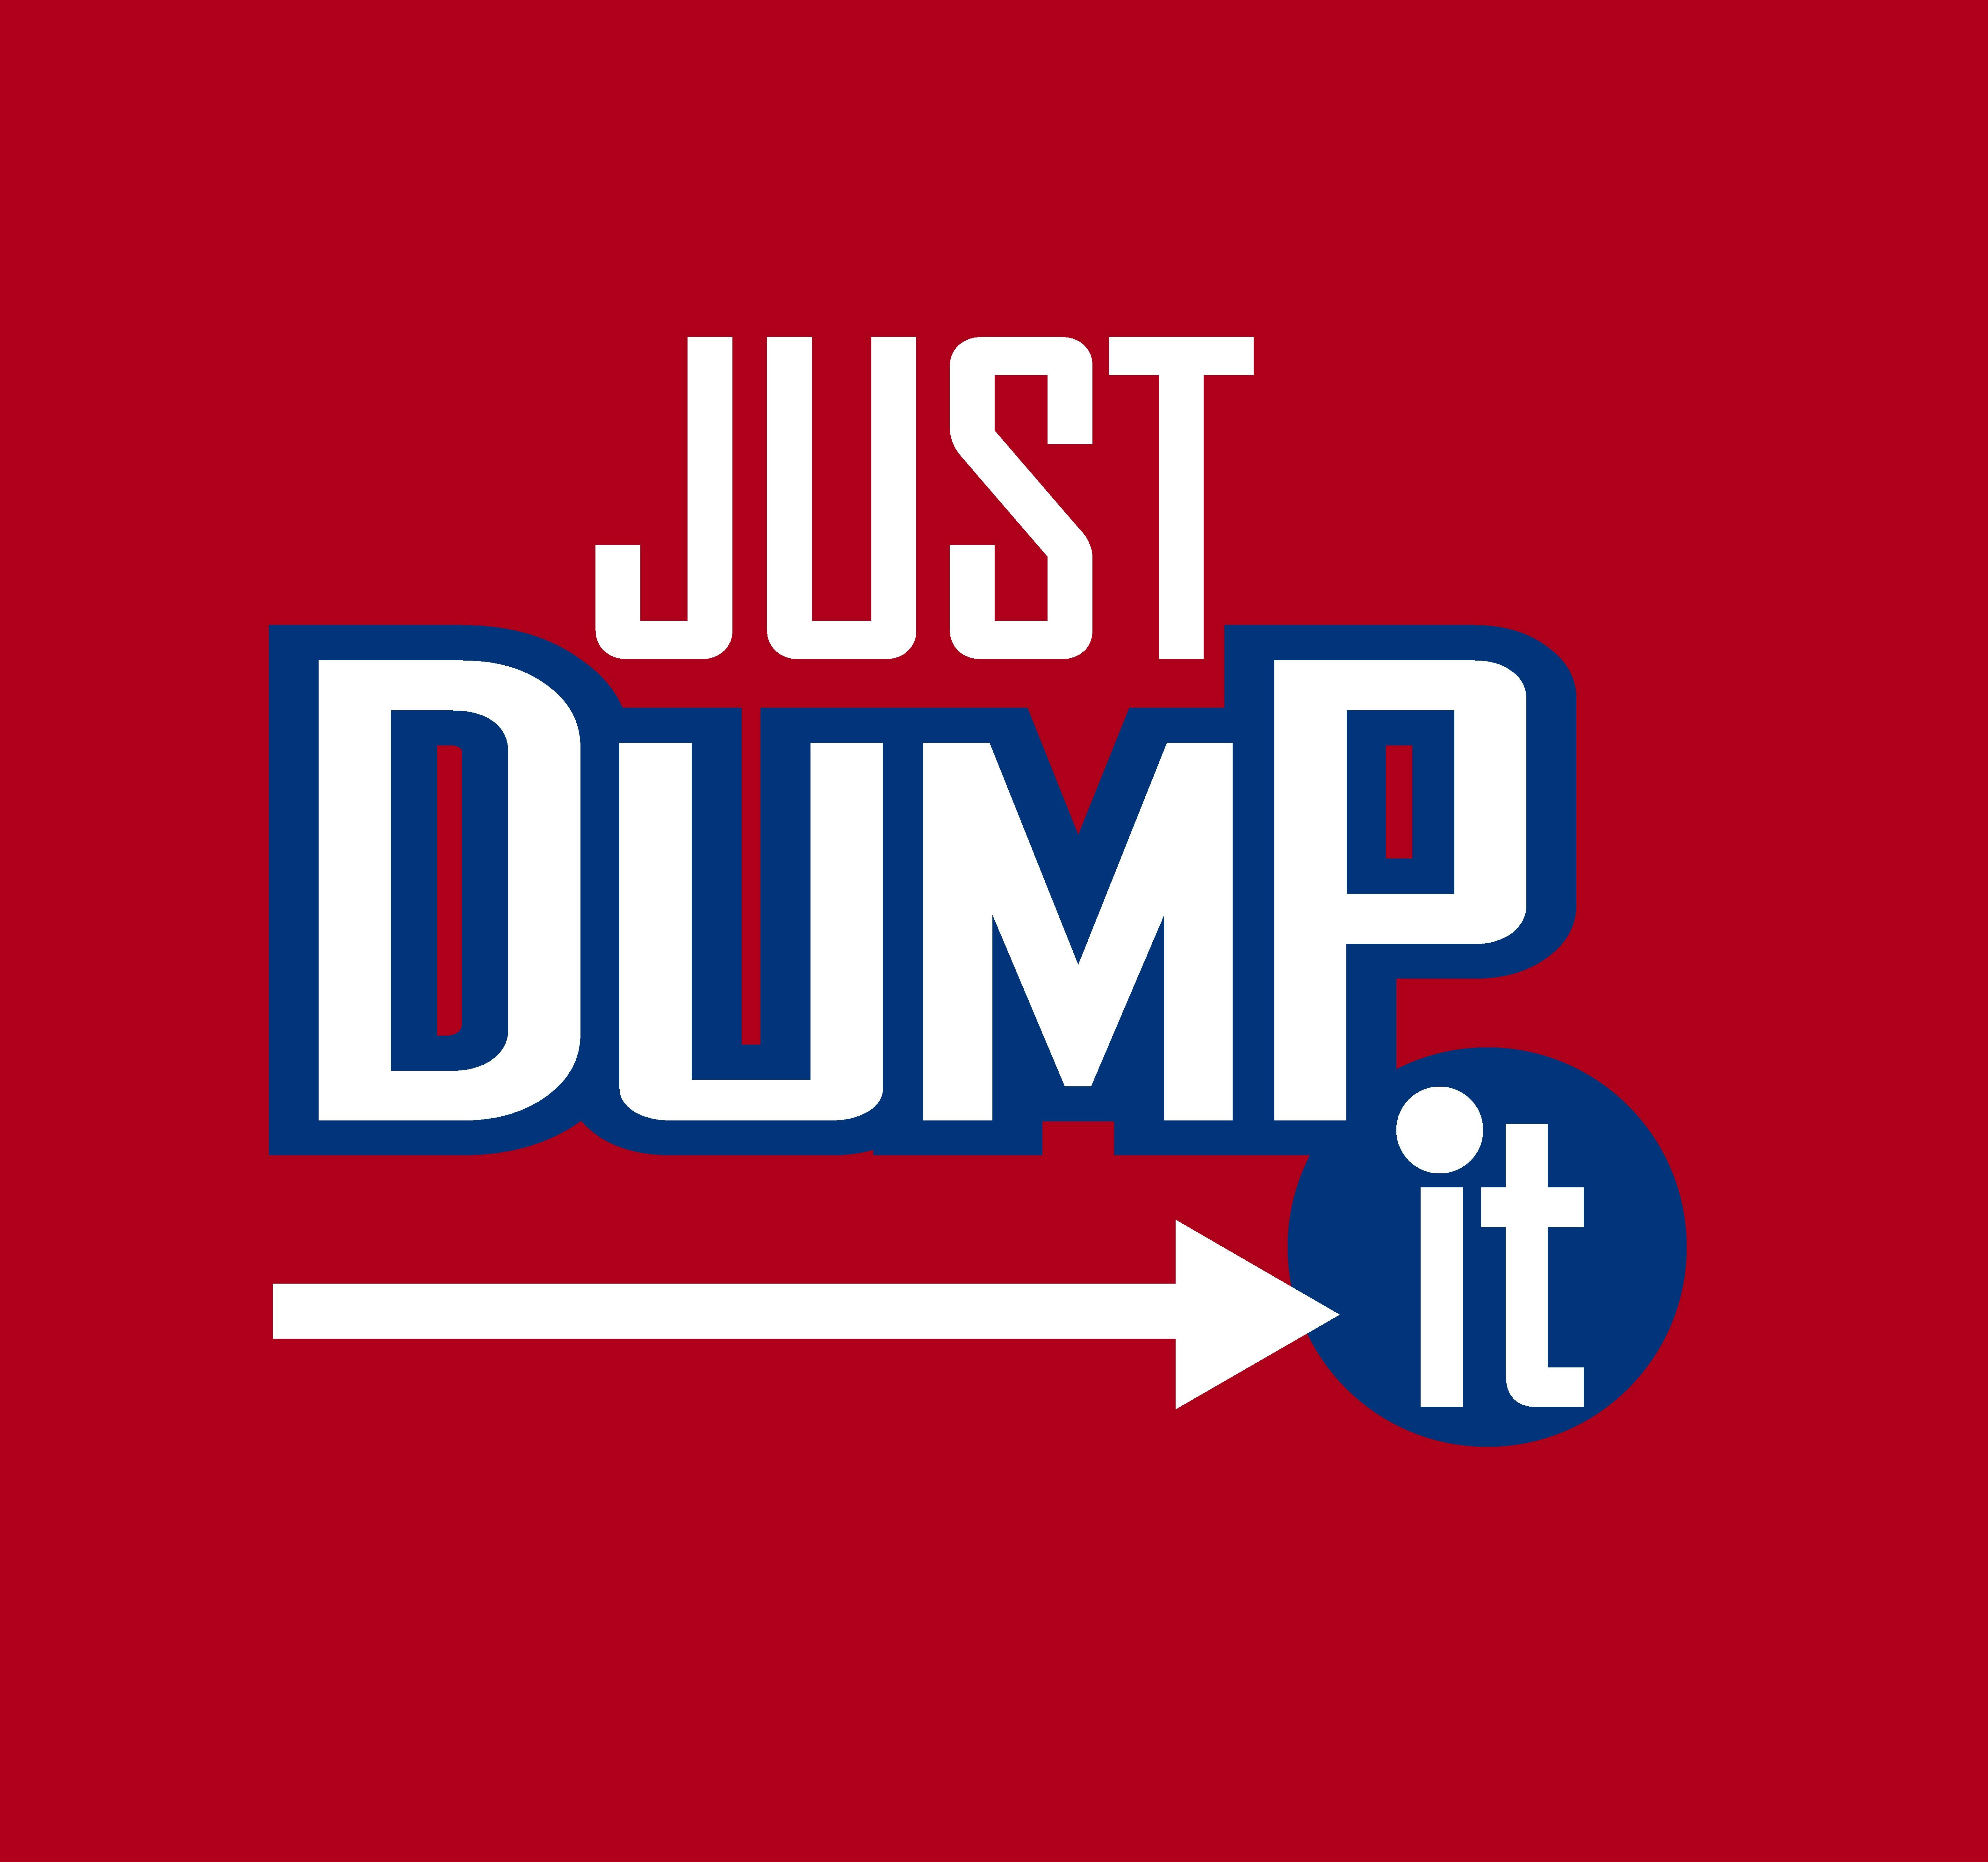 Just-dump-it